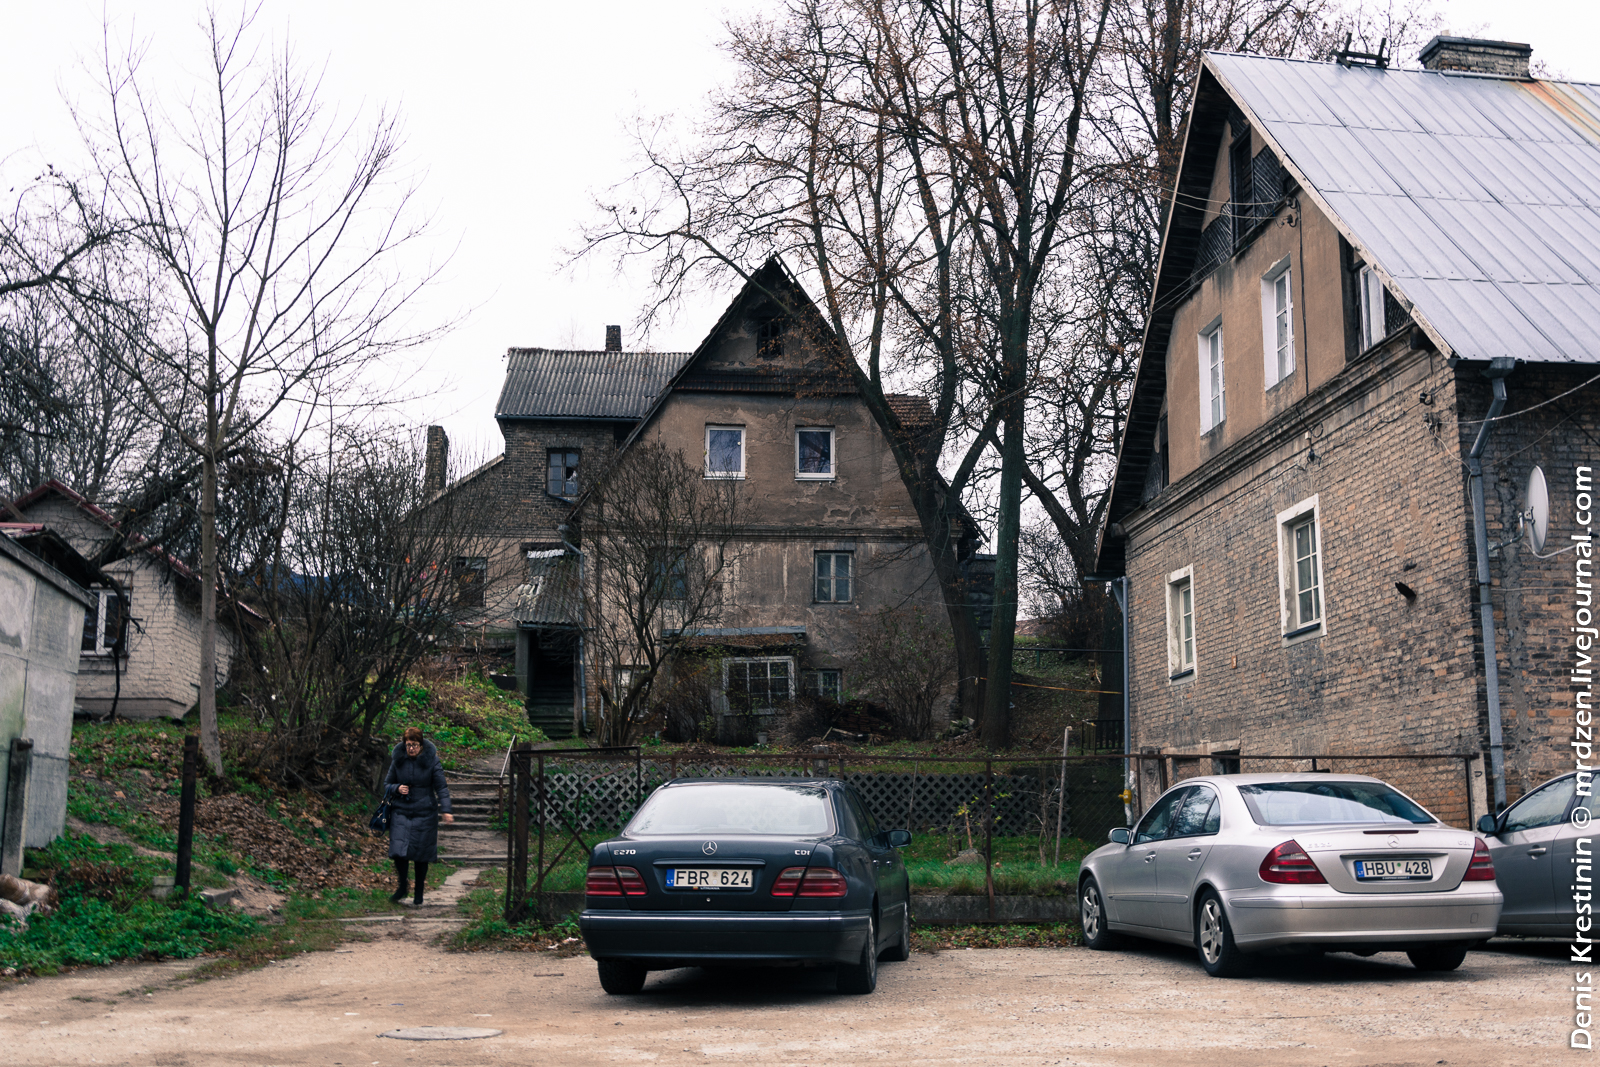 Вильнюс. Нетуристический дворик.